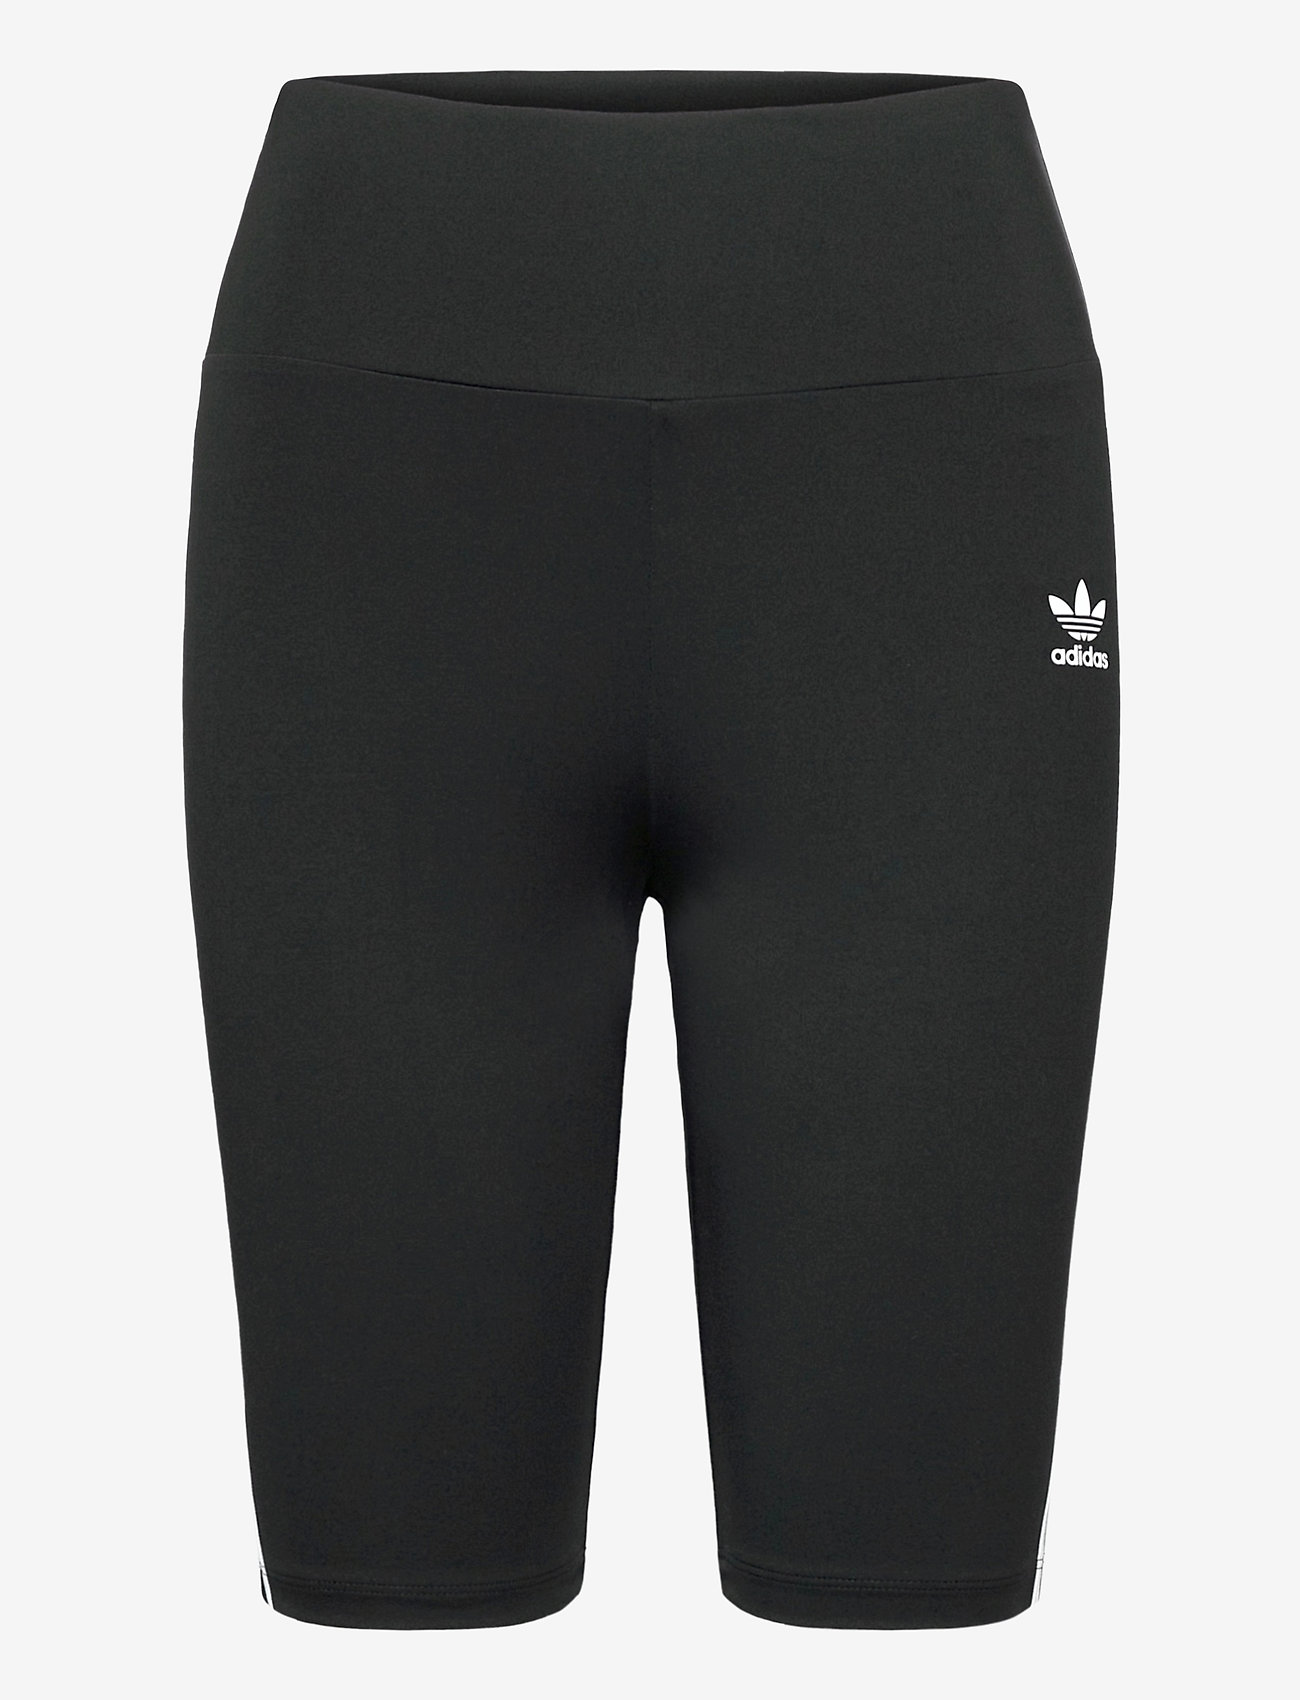 adidas Originals - Adicolor Classics Primeblue High-Waisted PB Short Tights W - træningsshorts - black - 1